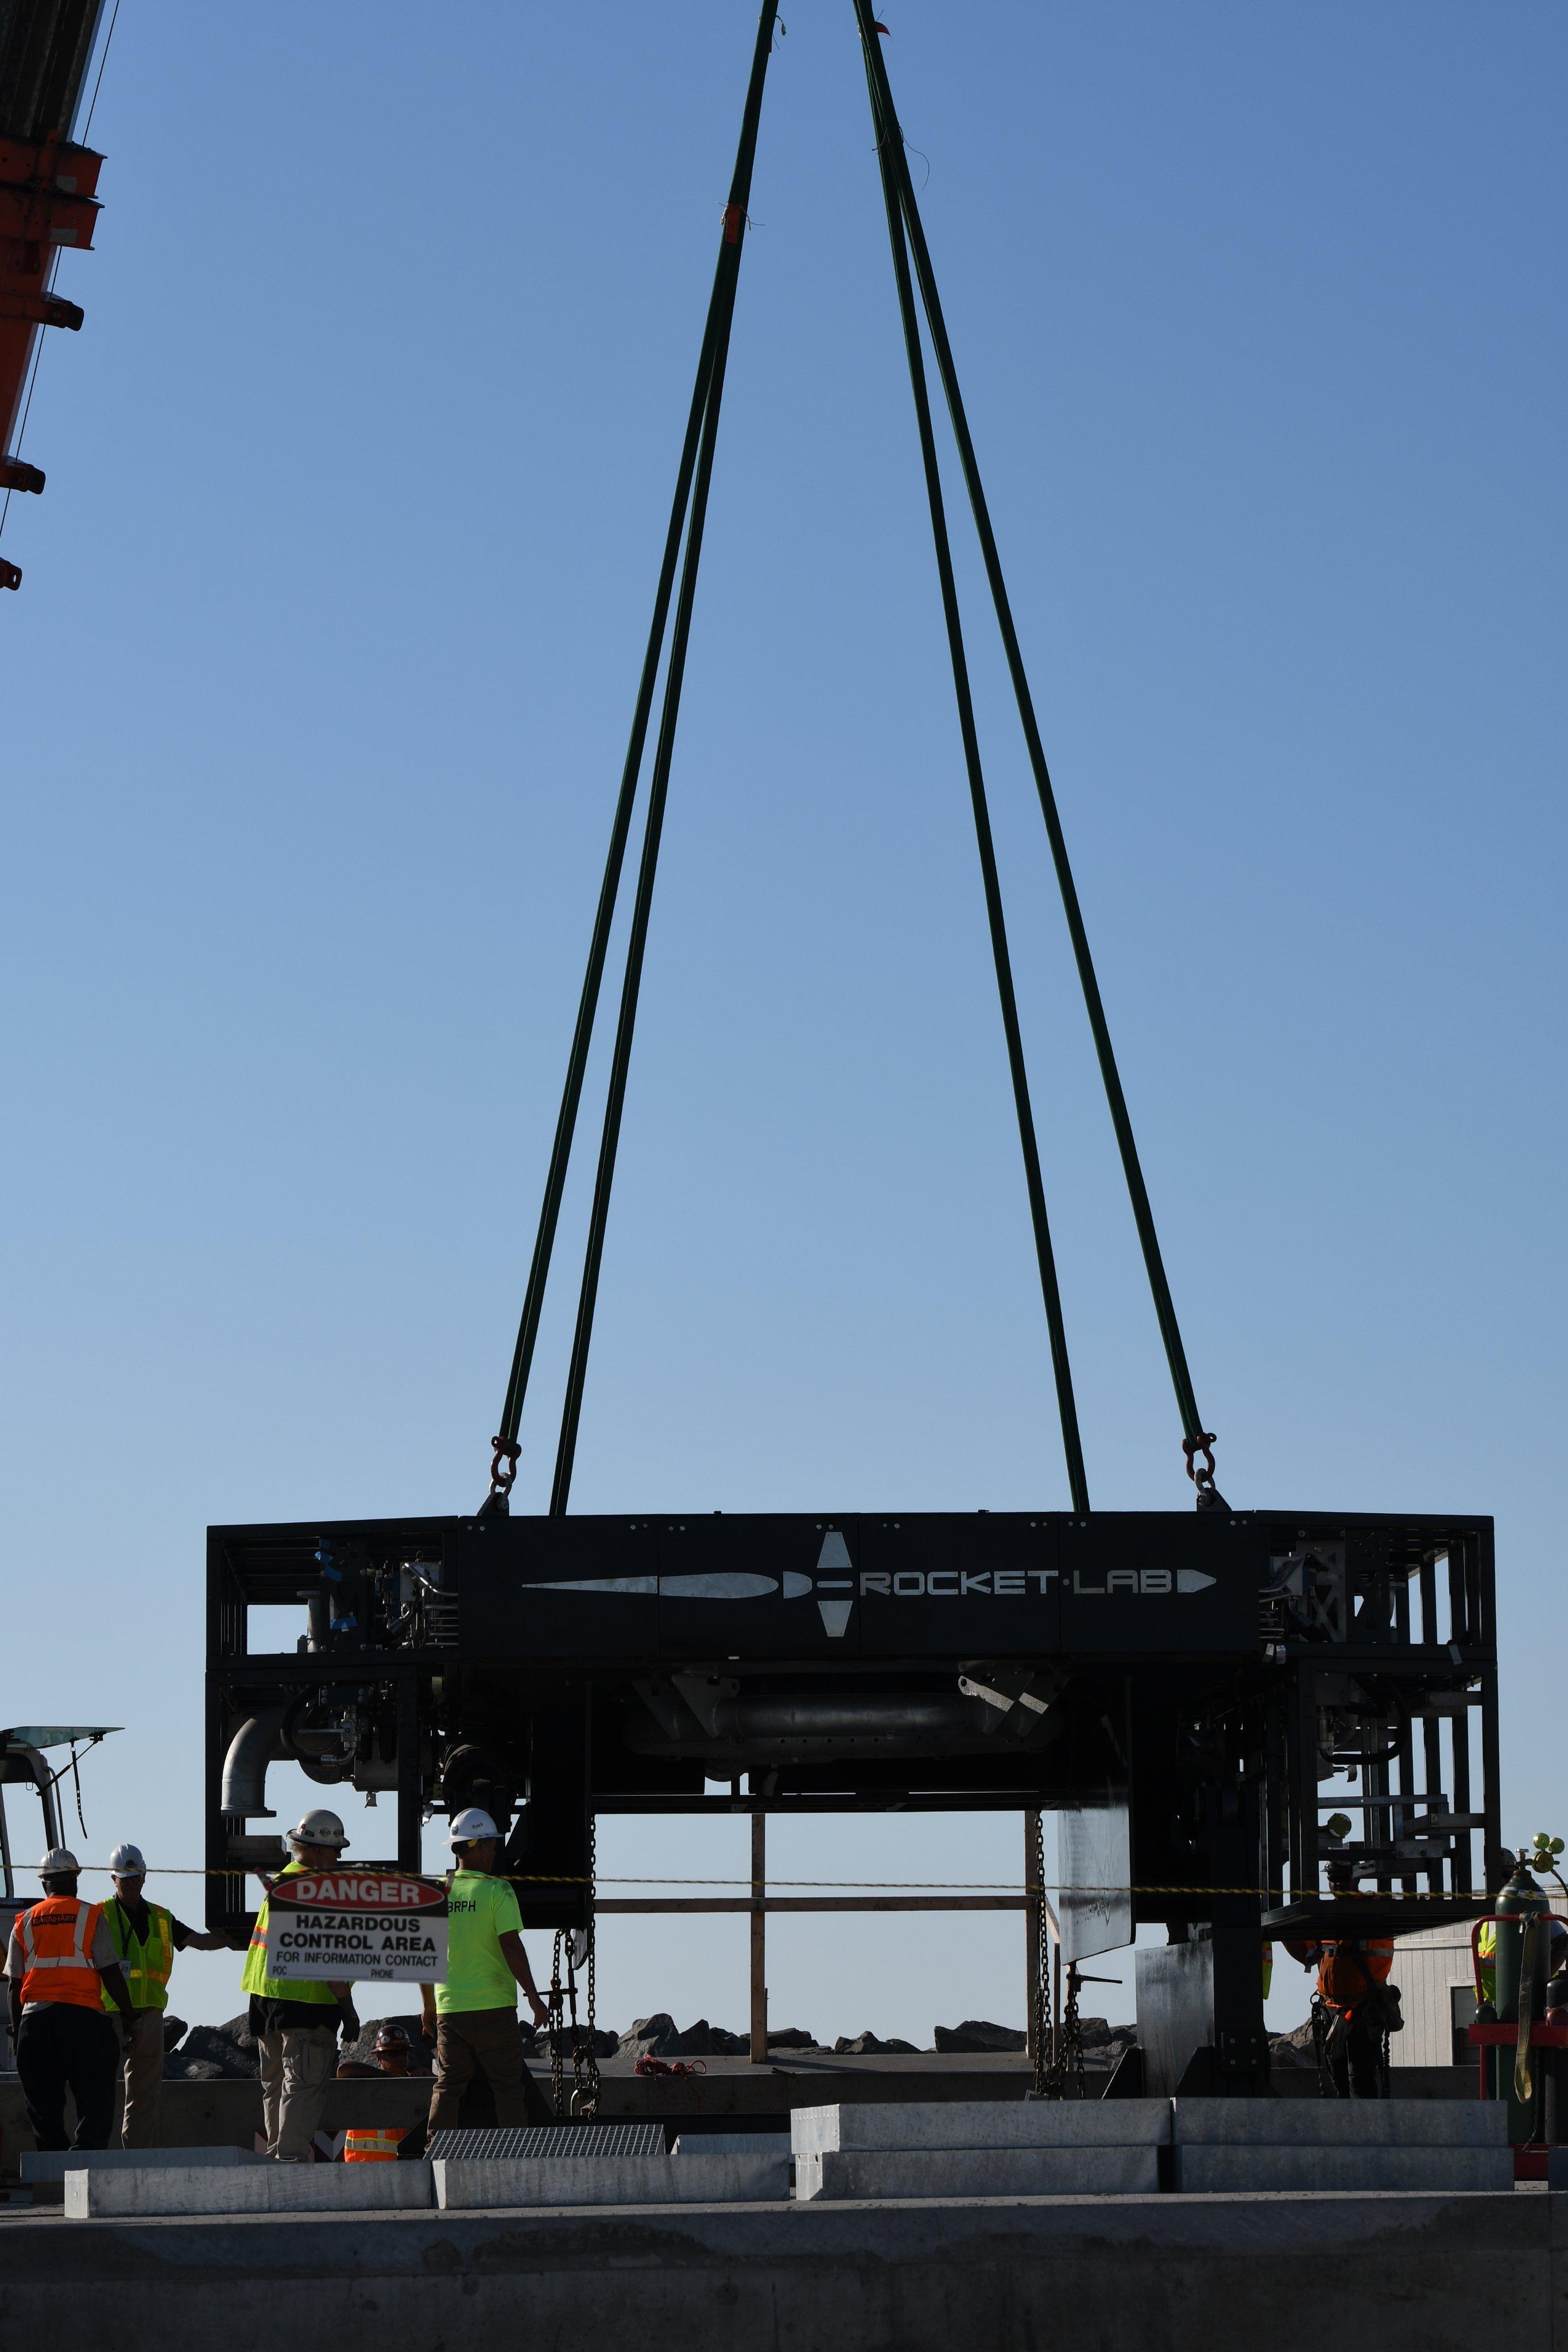 The Rocket Lab launch platform.